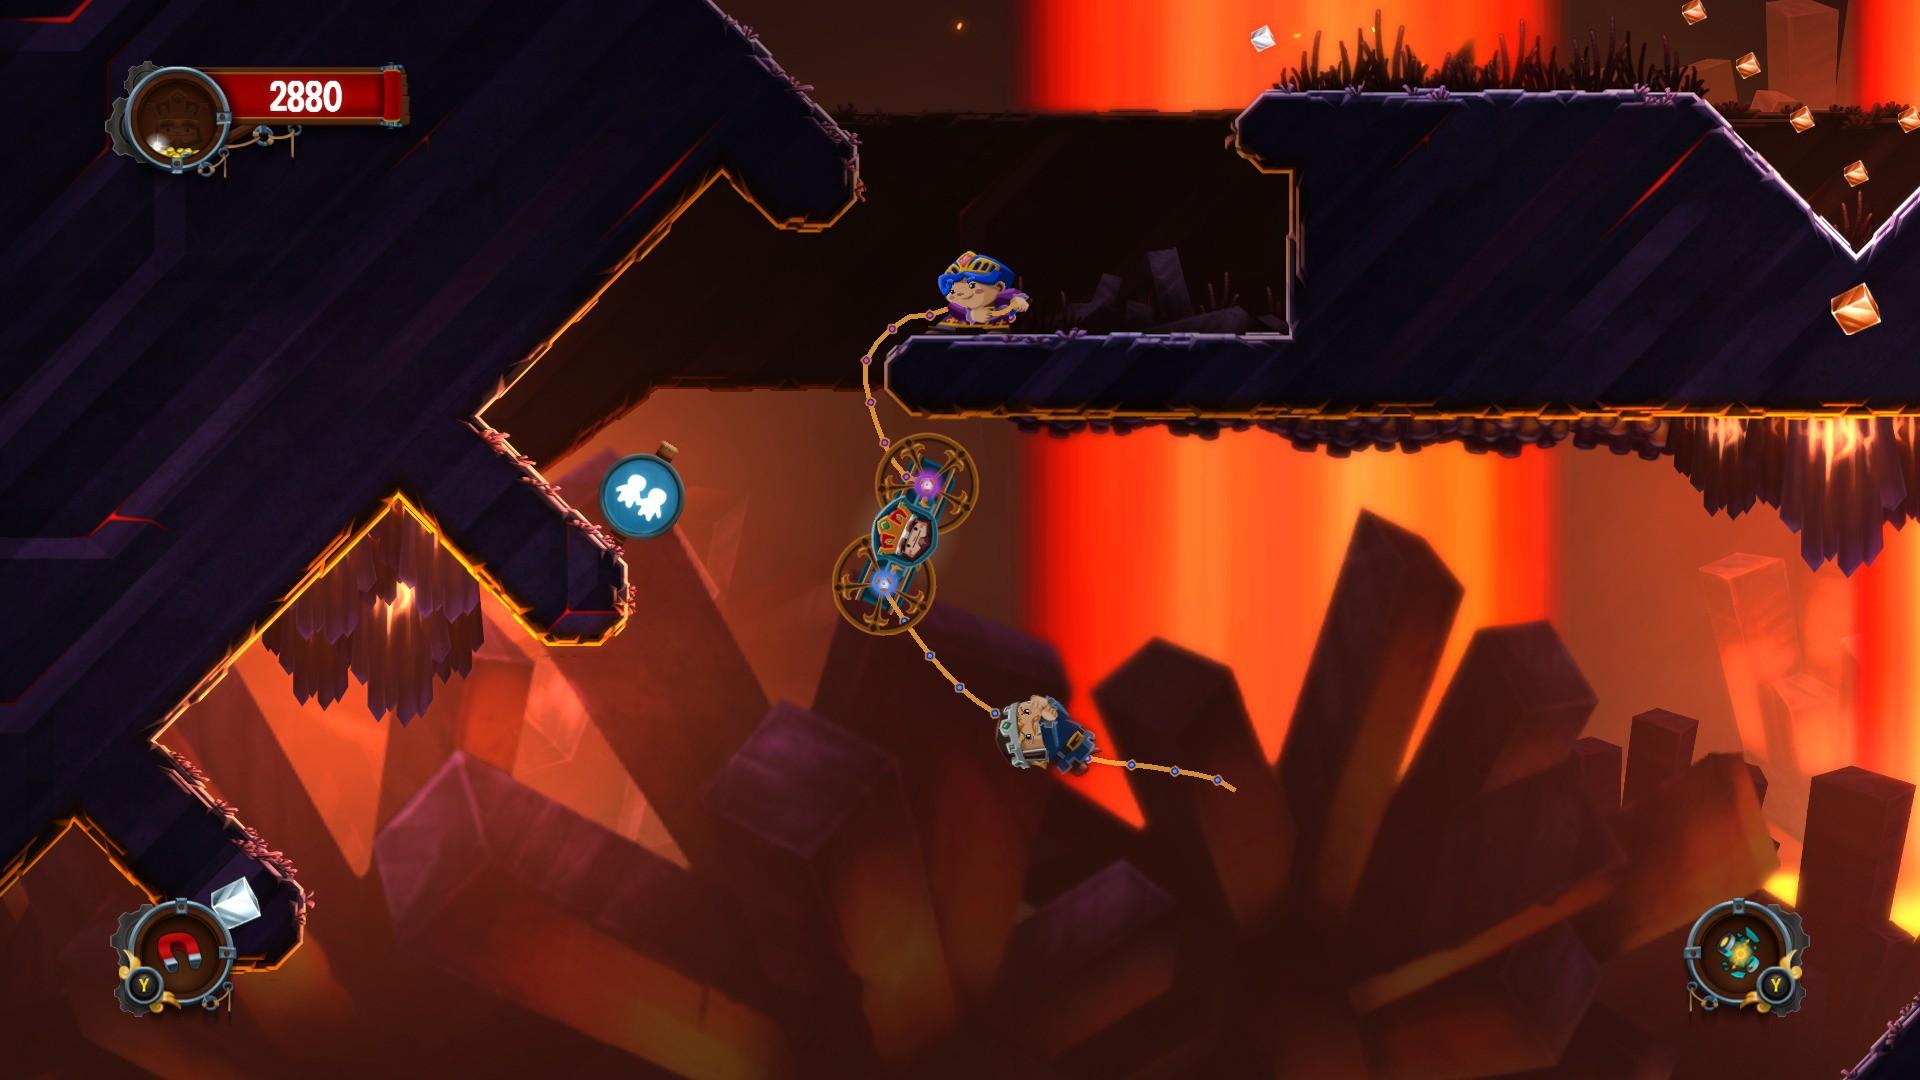 Chariot (ゲーム)